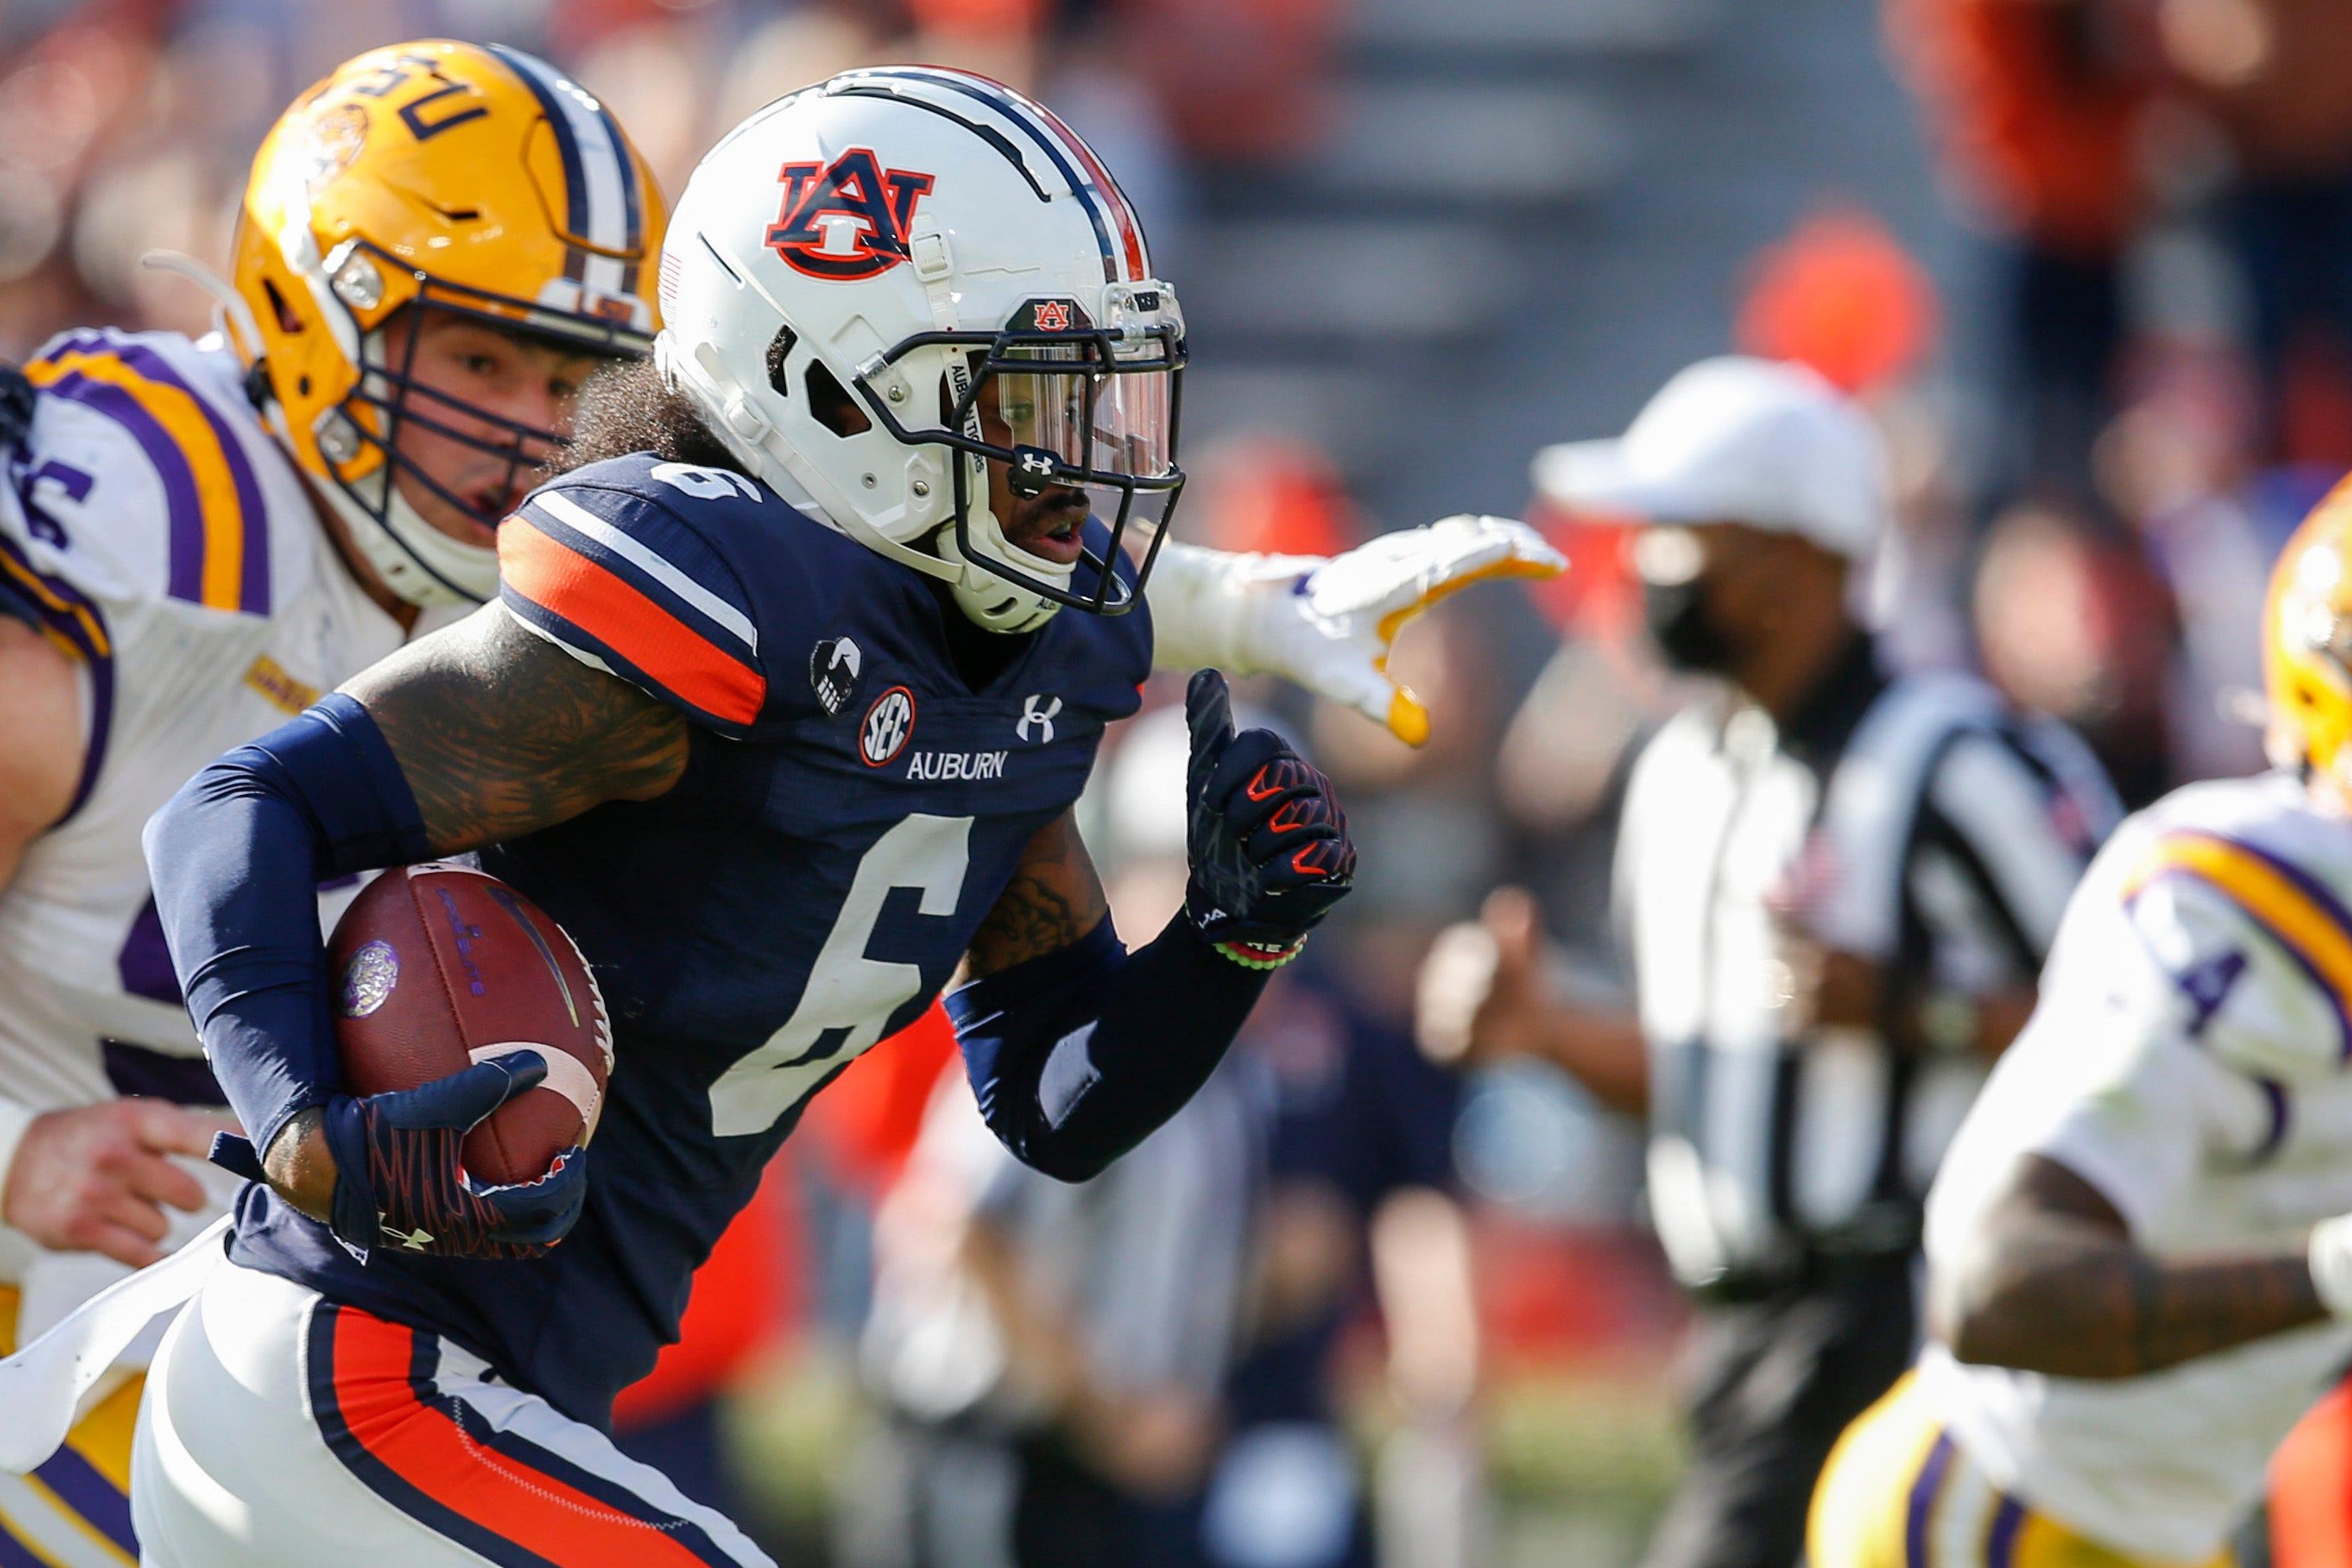 LSU Tigers Football Embarrassed By Auburn